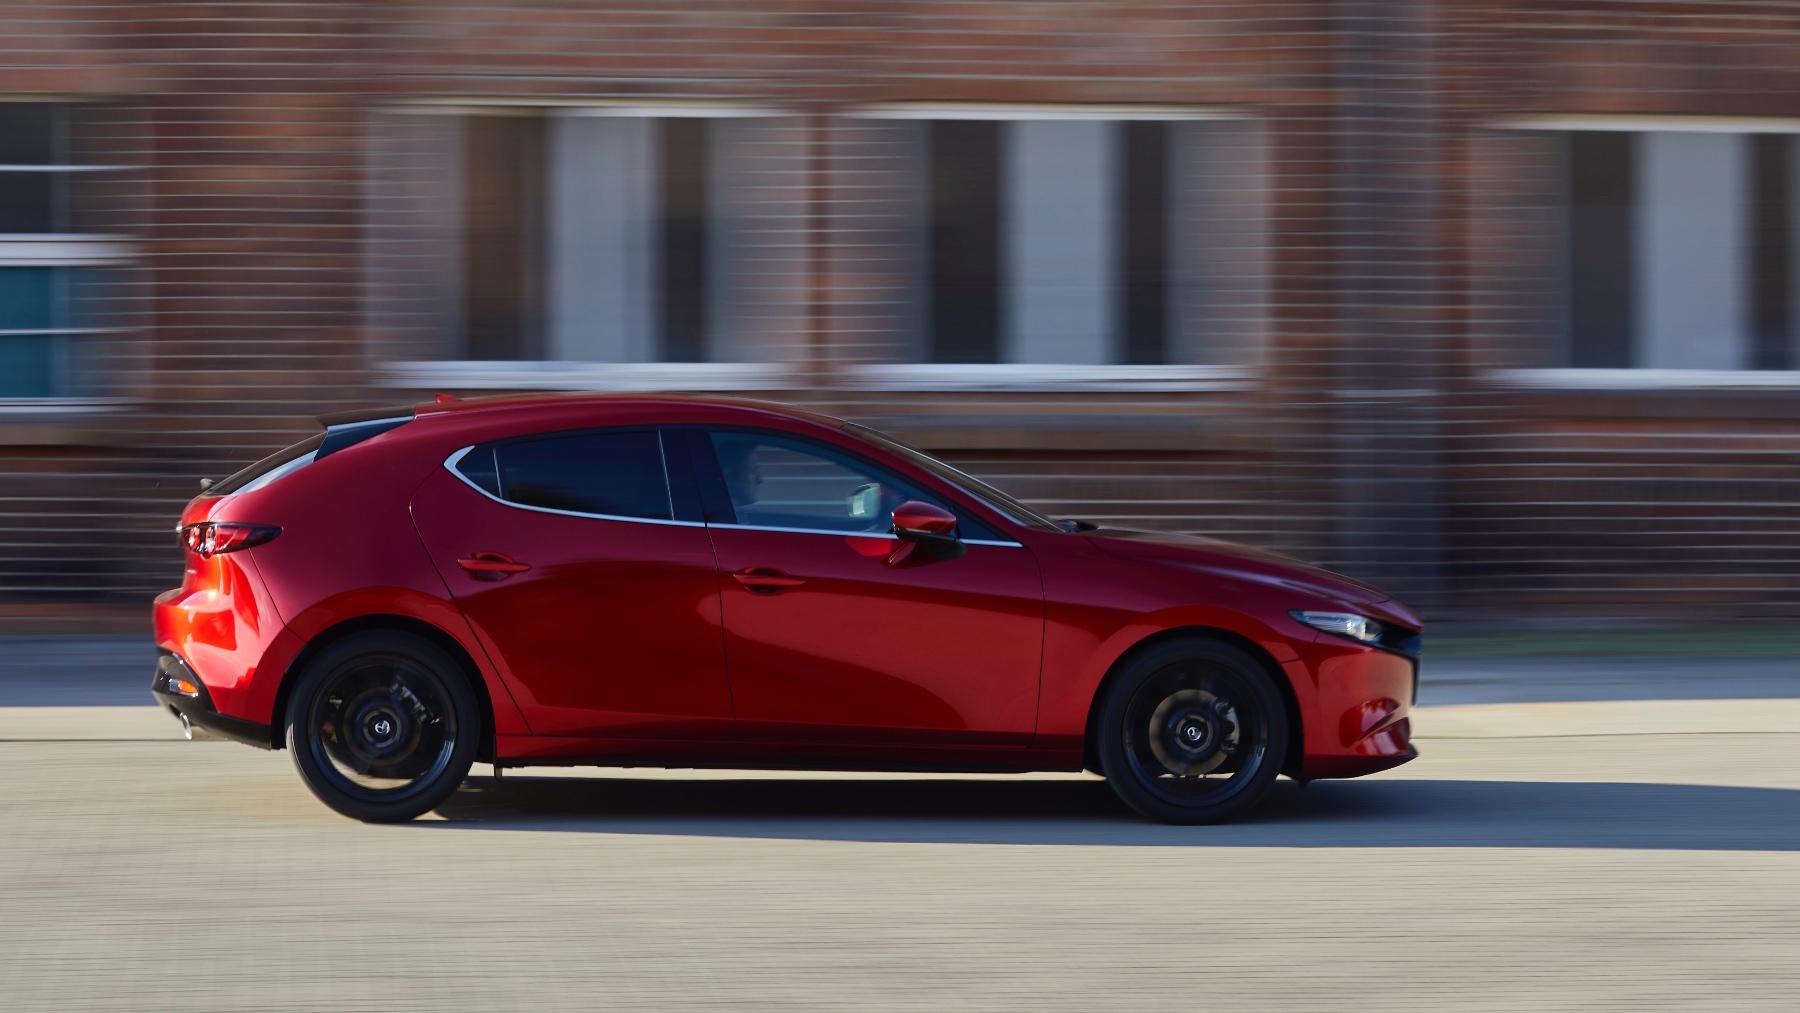 New & Used Mazda Dealership near Kissimmee, FL